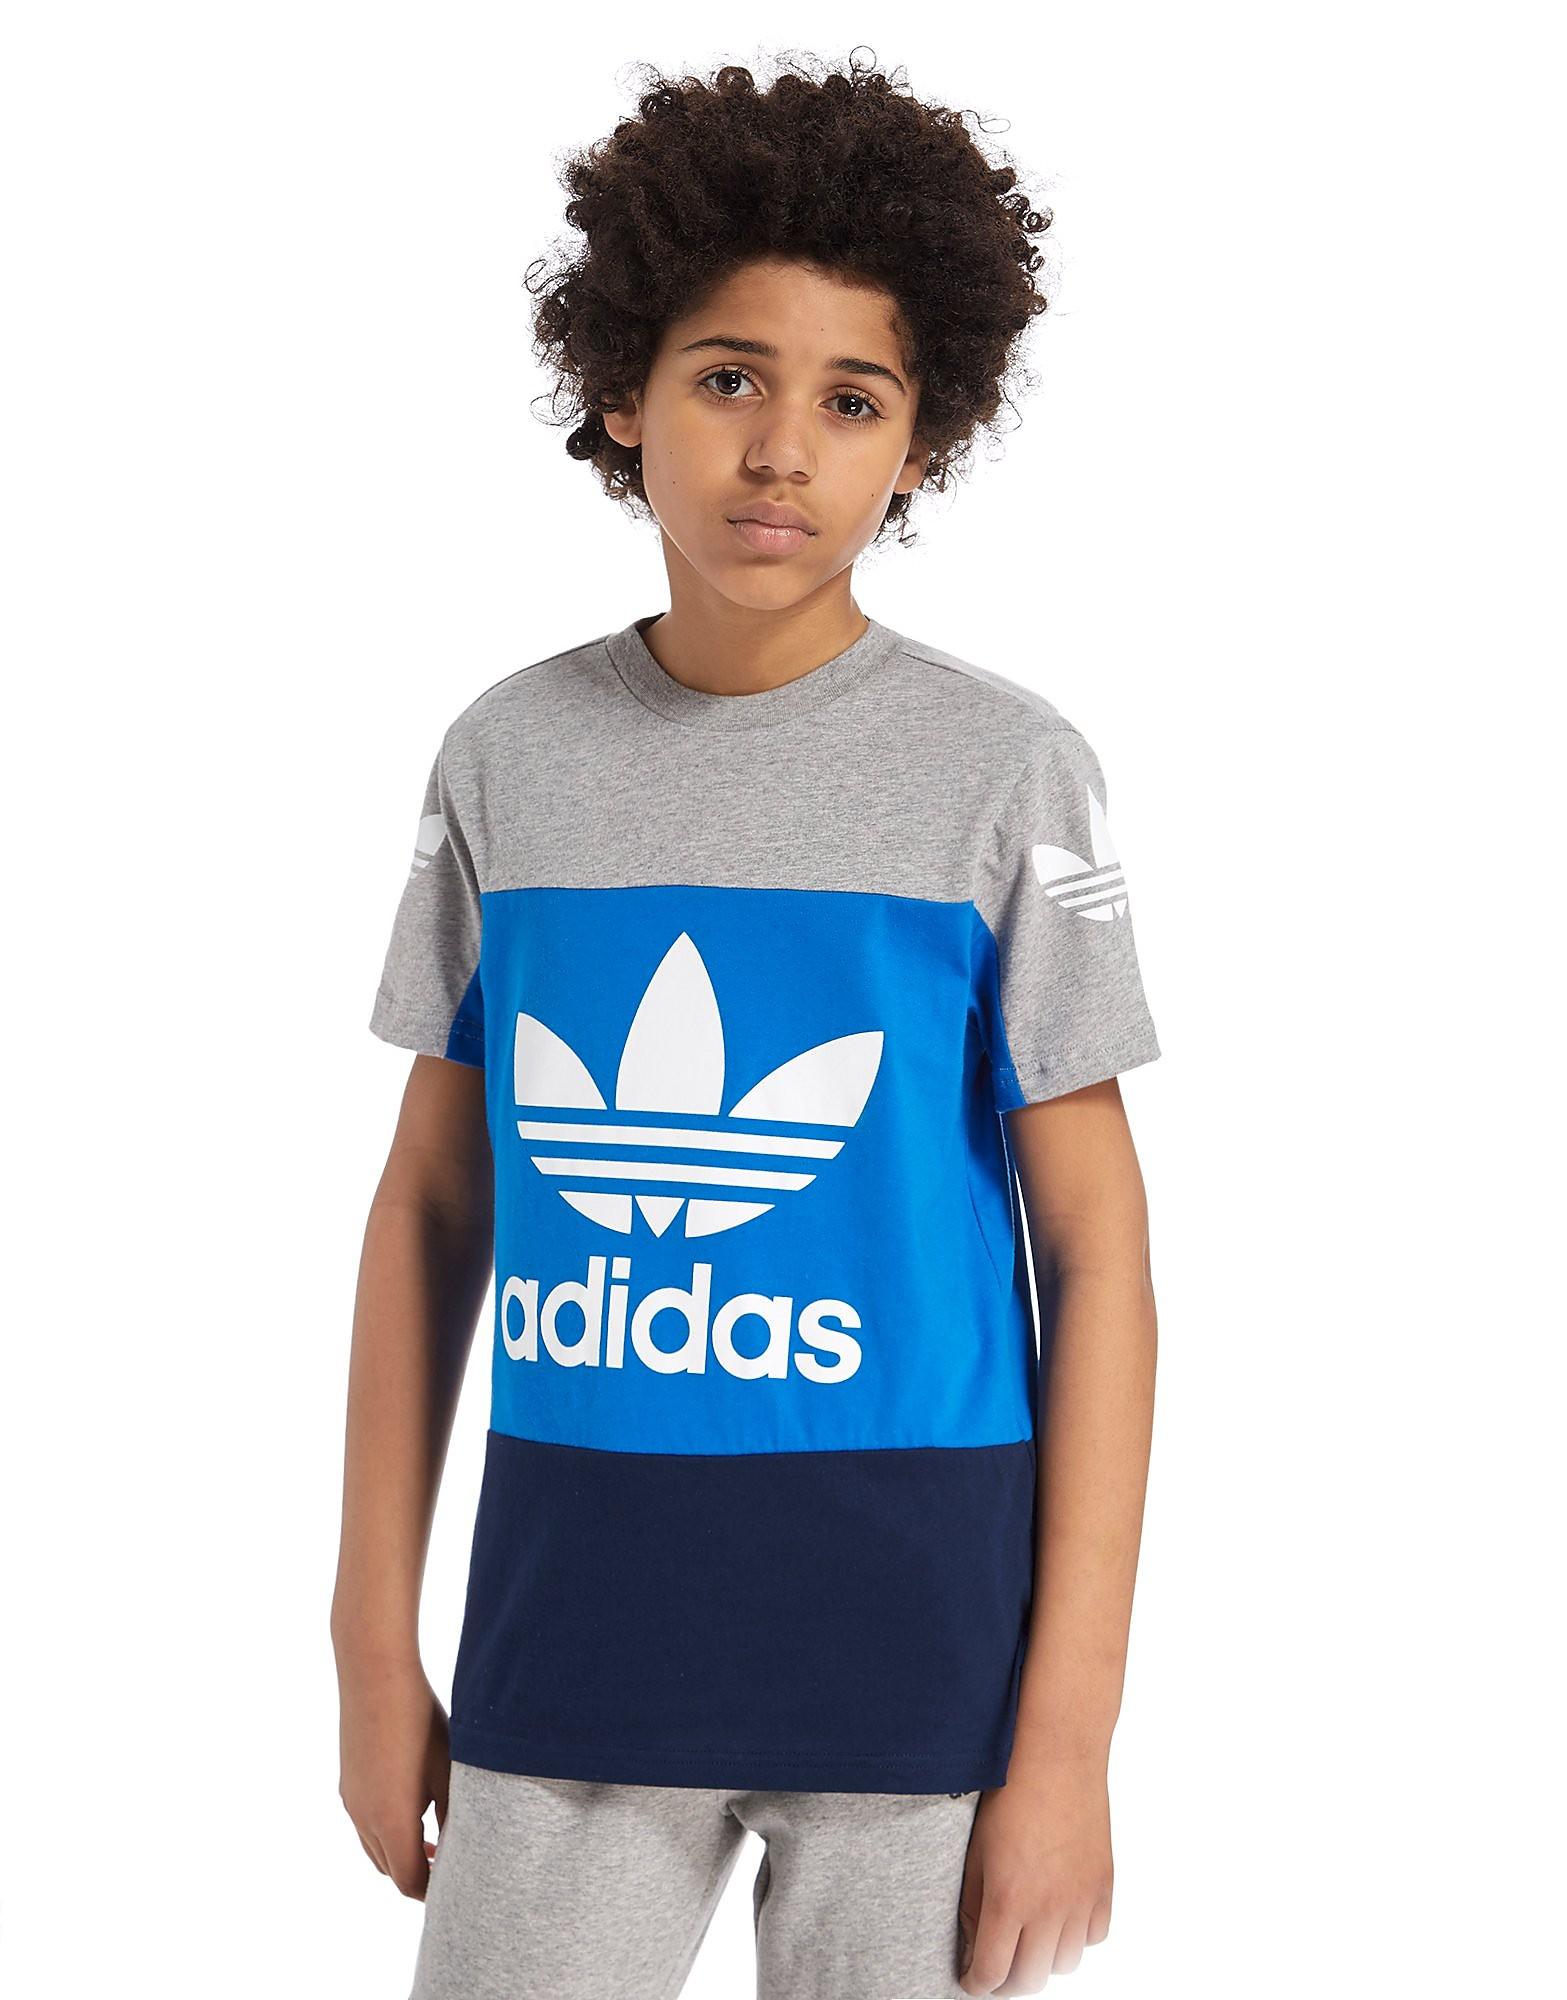 adidas Originals Trefoil geradliniges Colourblock-T-Shirt - Kinder